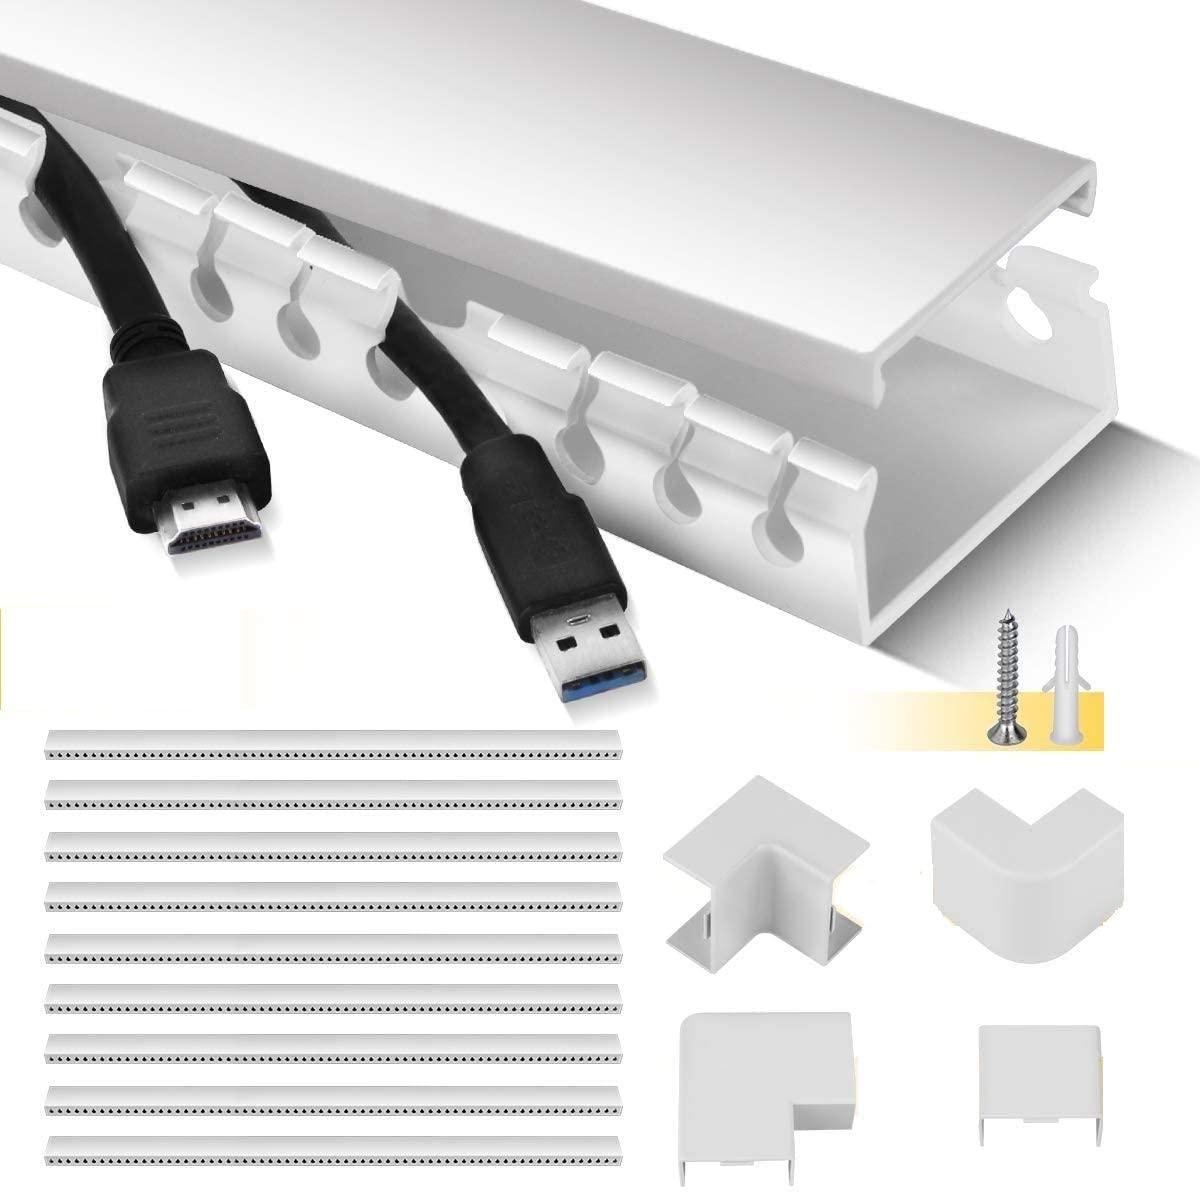 Canaleta para organizar cables